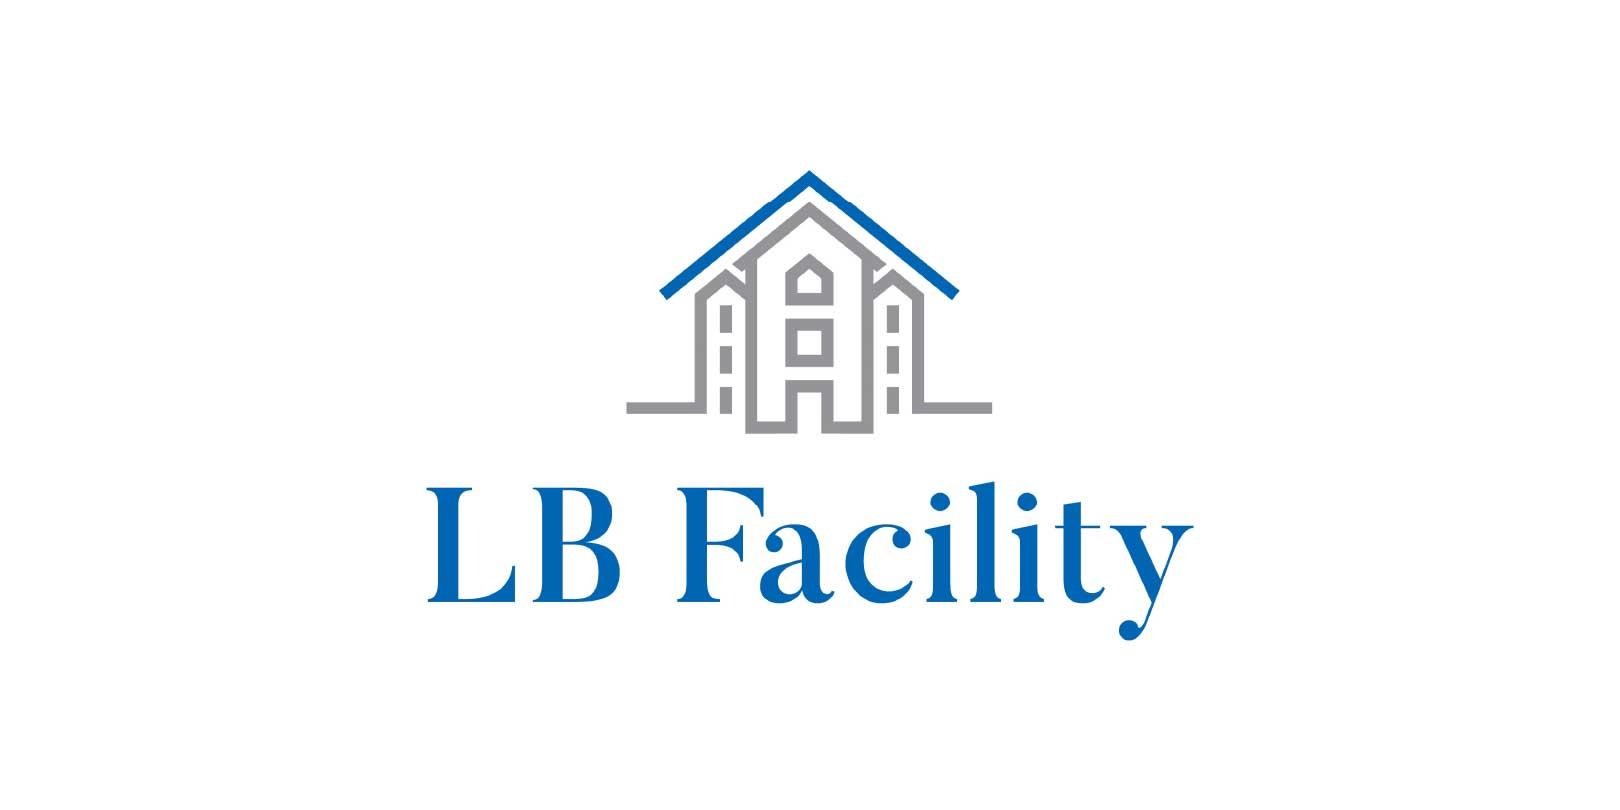 LB Facility